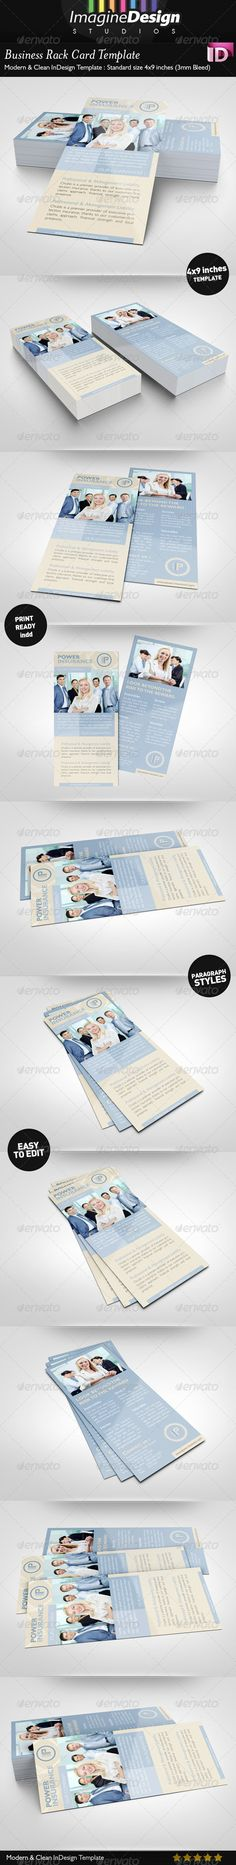 Rack Card Design  Insideout Solutions  Design  Rack Cards